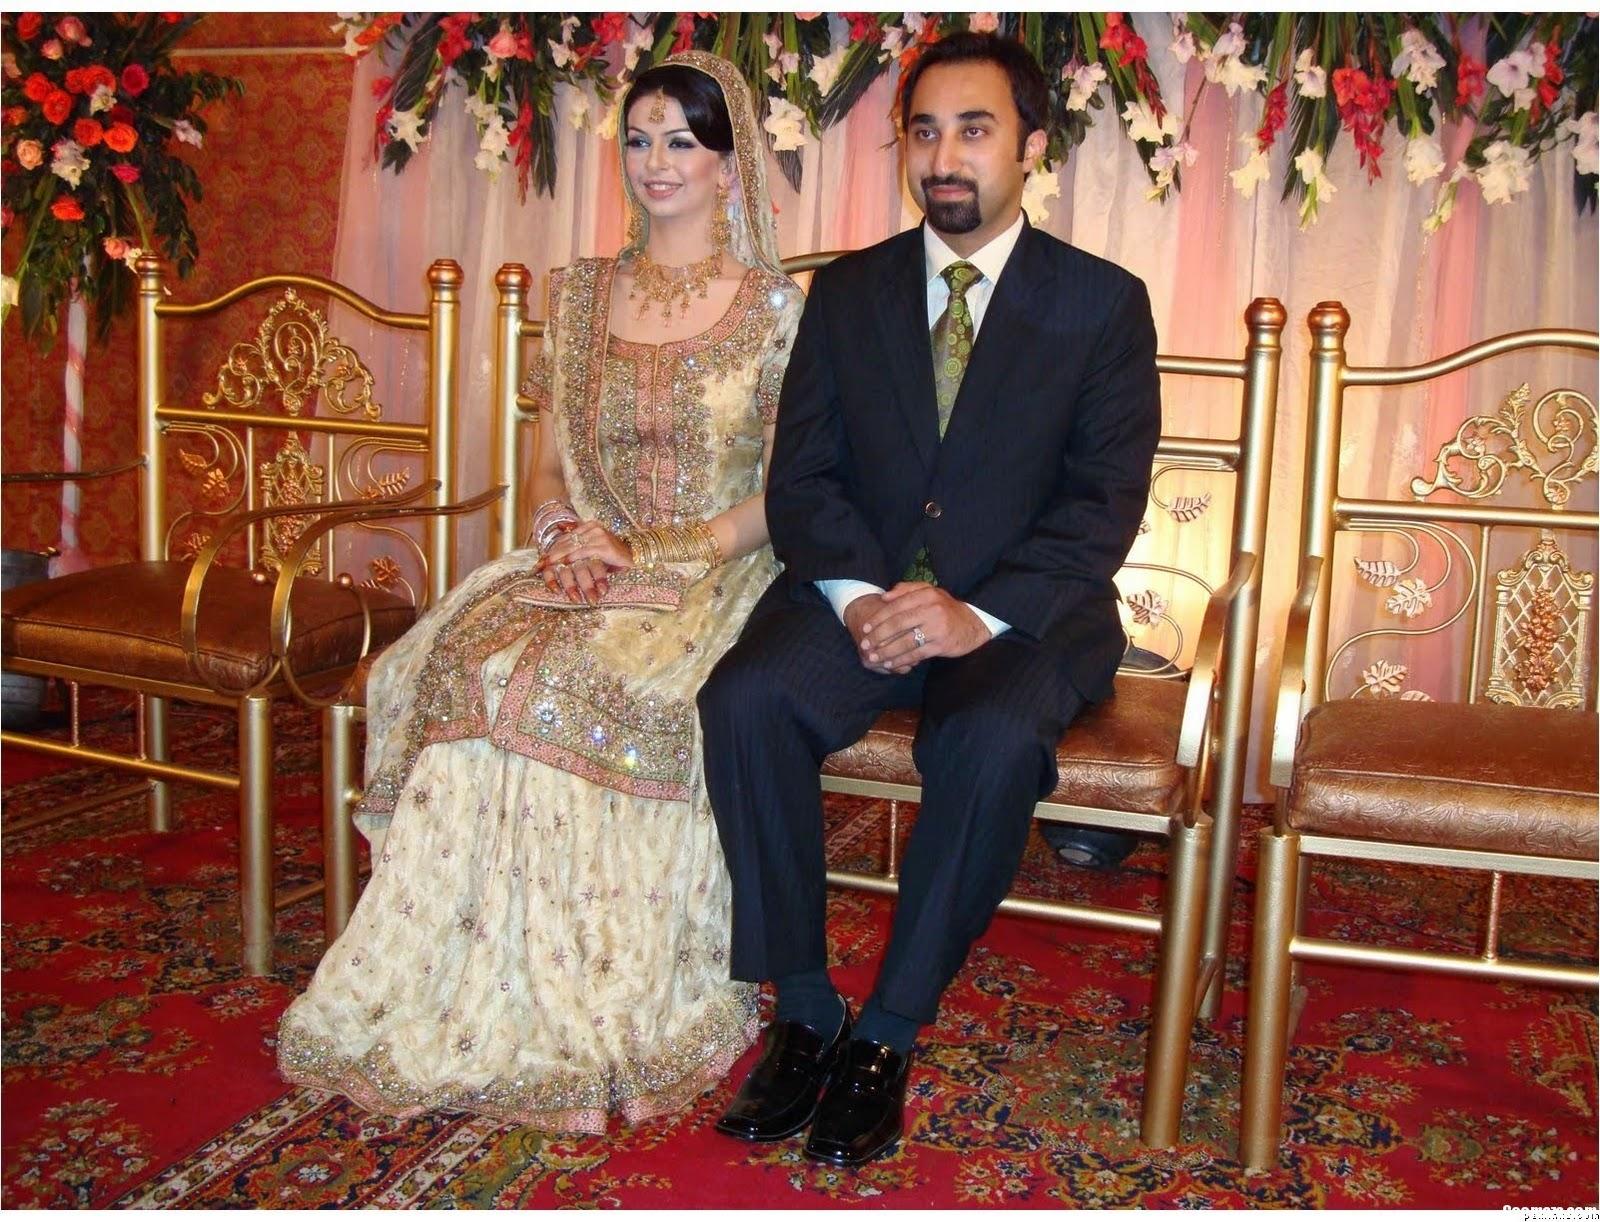 wedding dress for bride and groom | Wedding